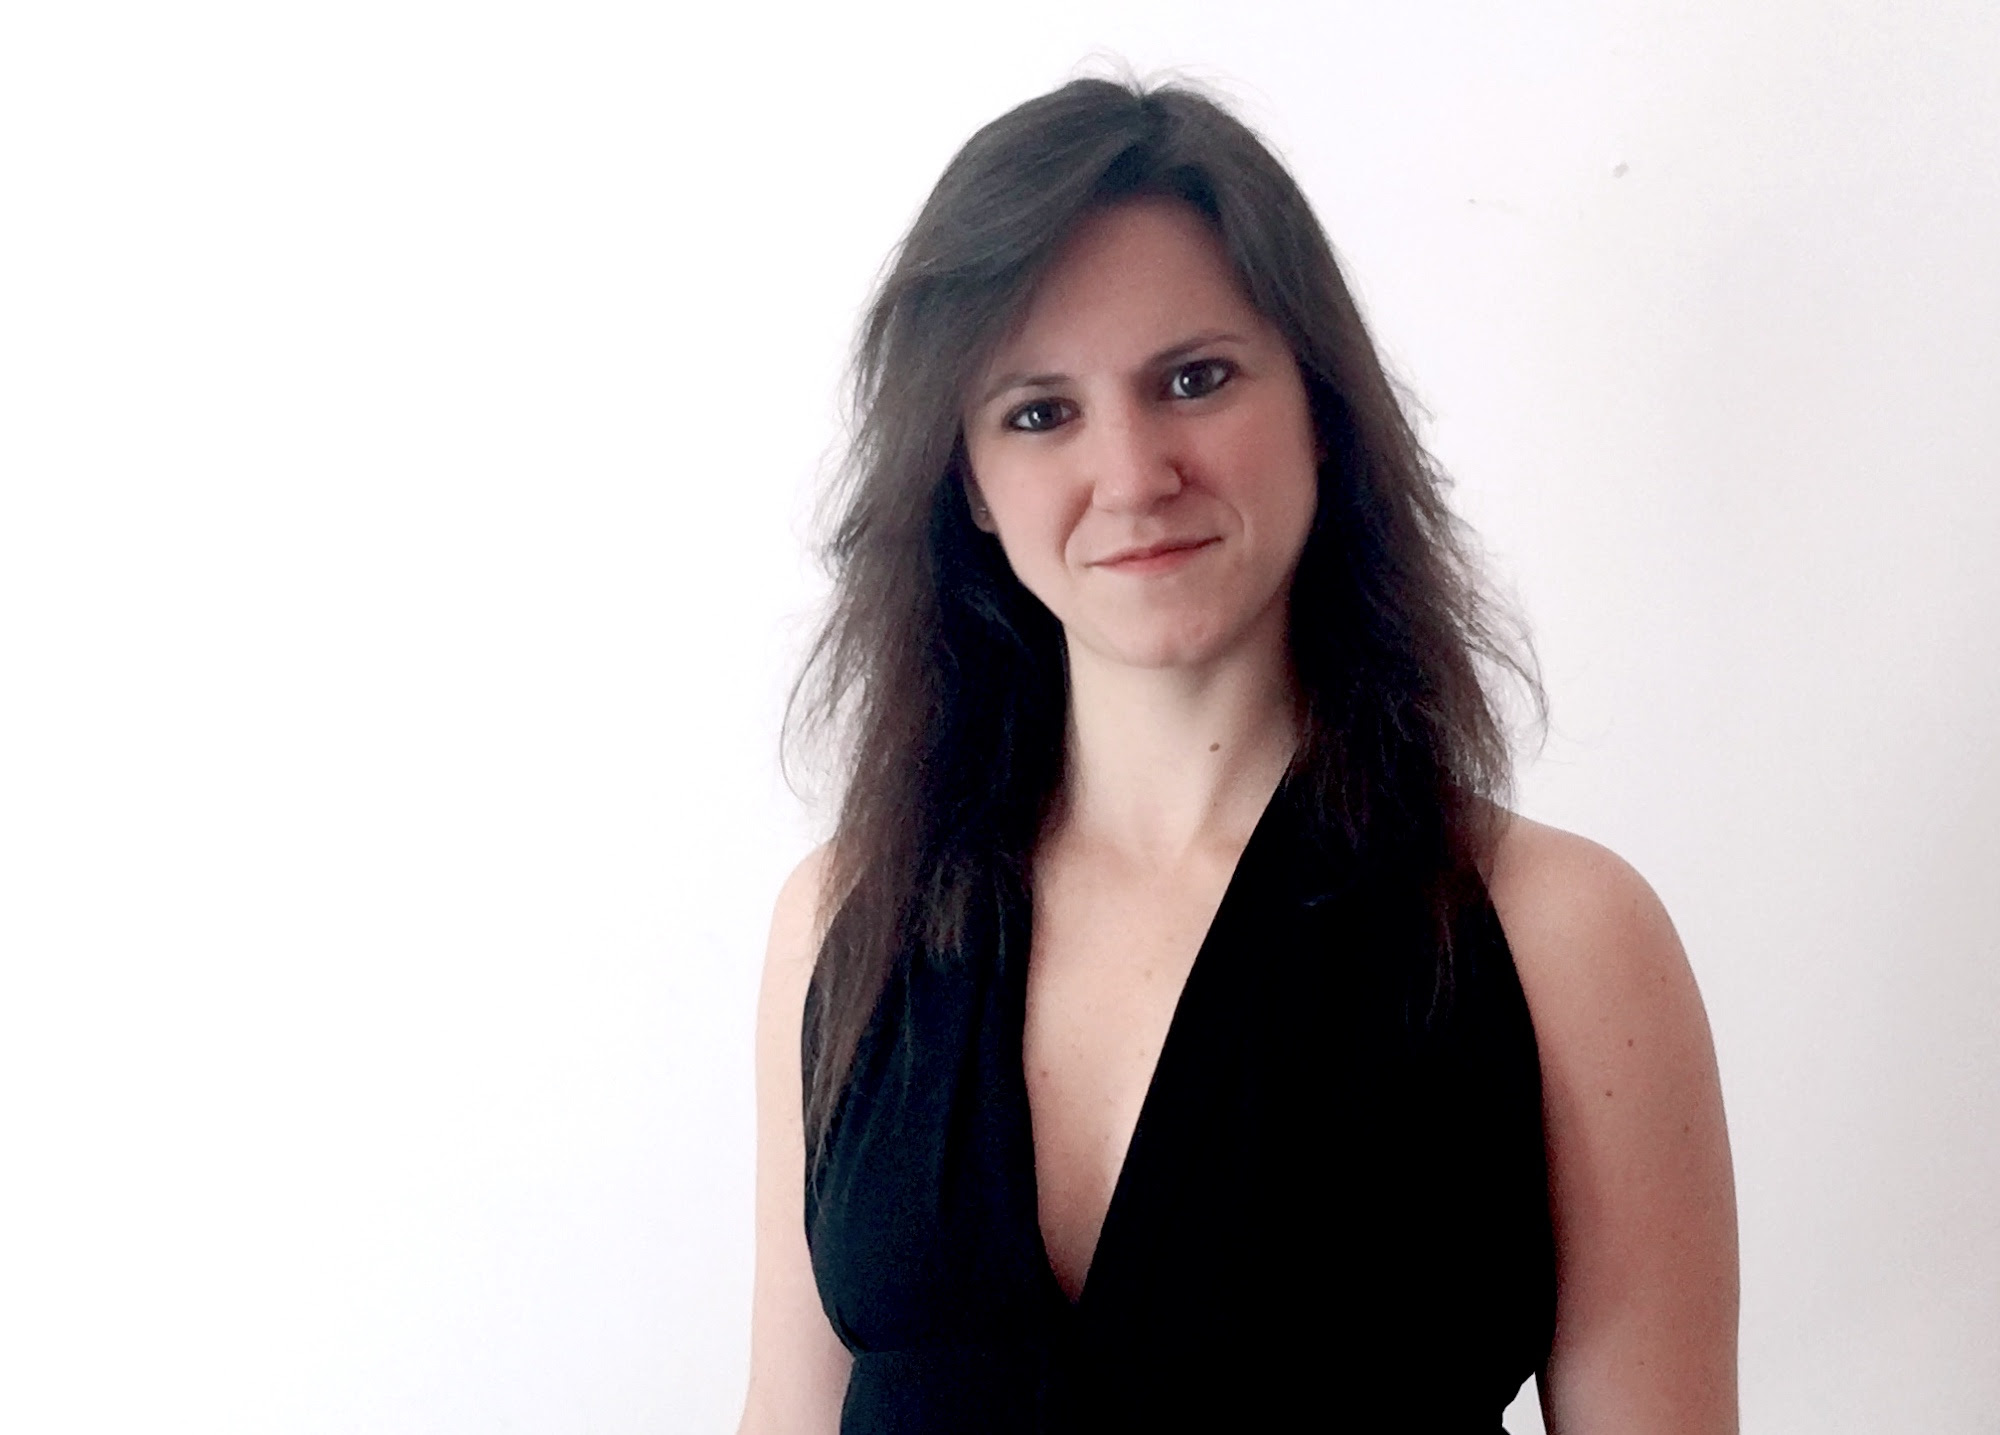 Chiara Biagioli